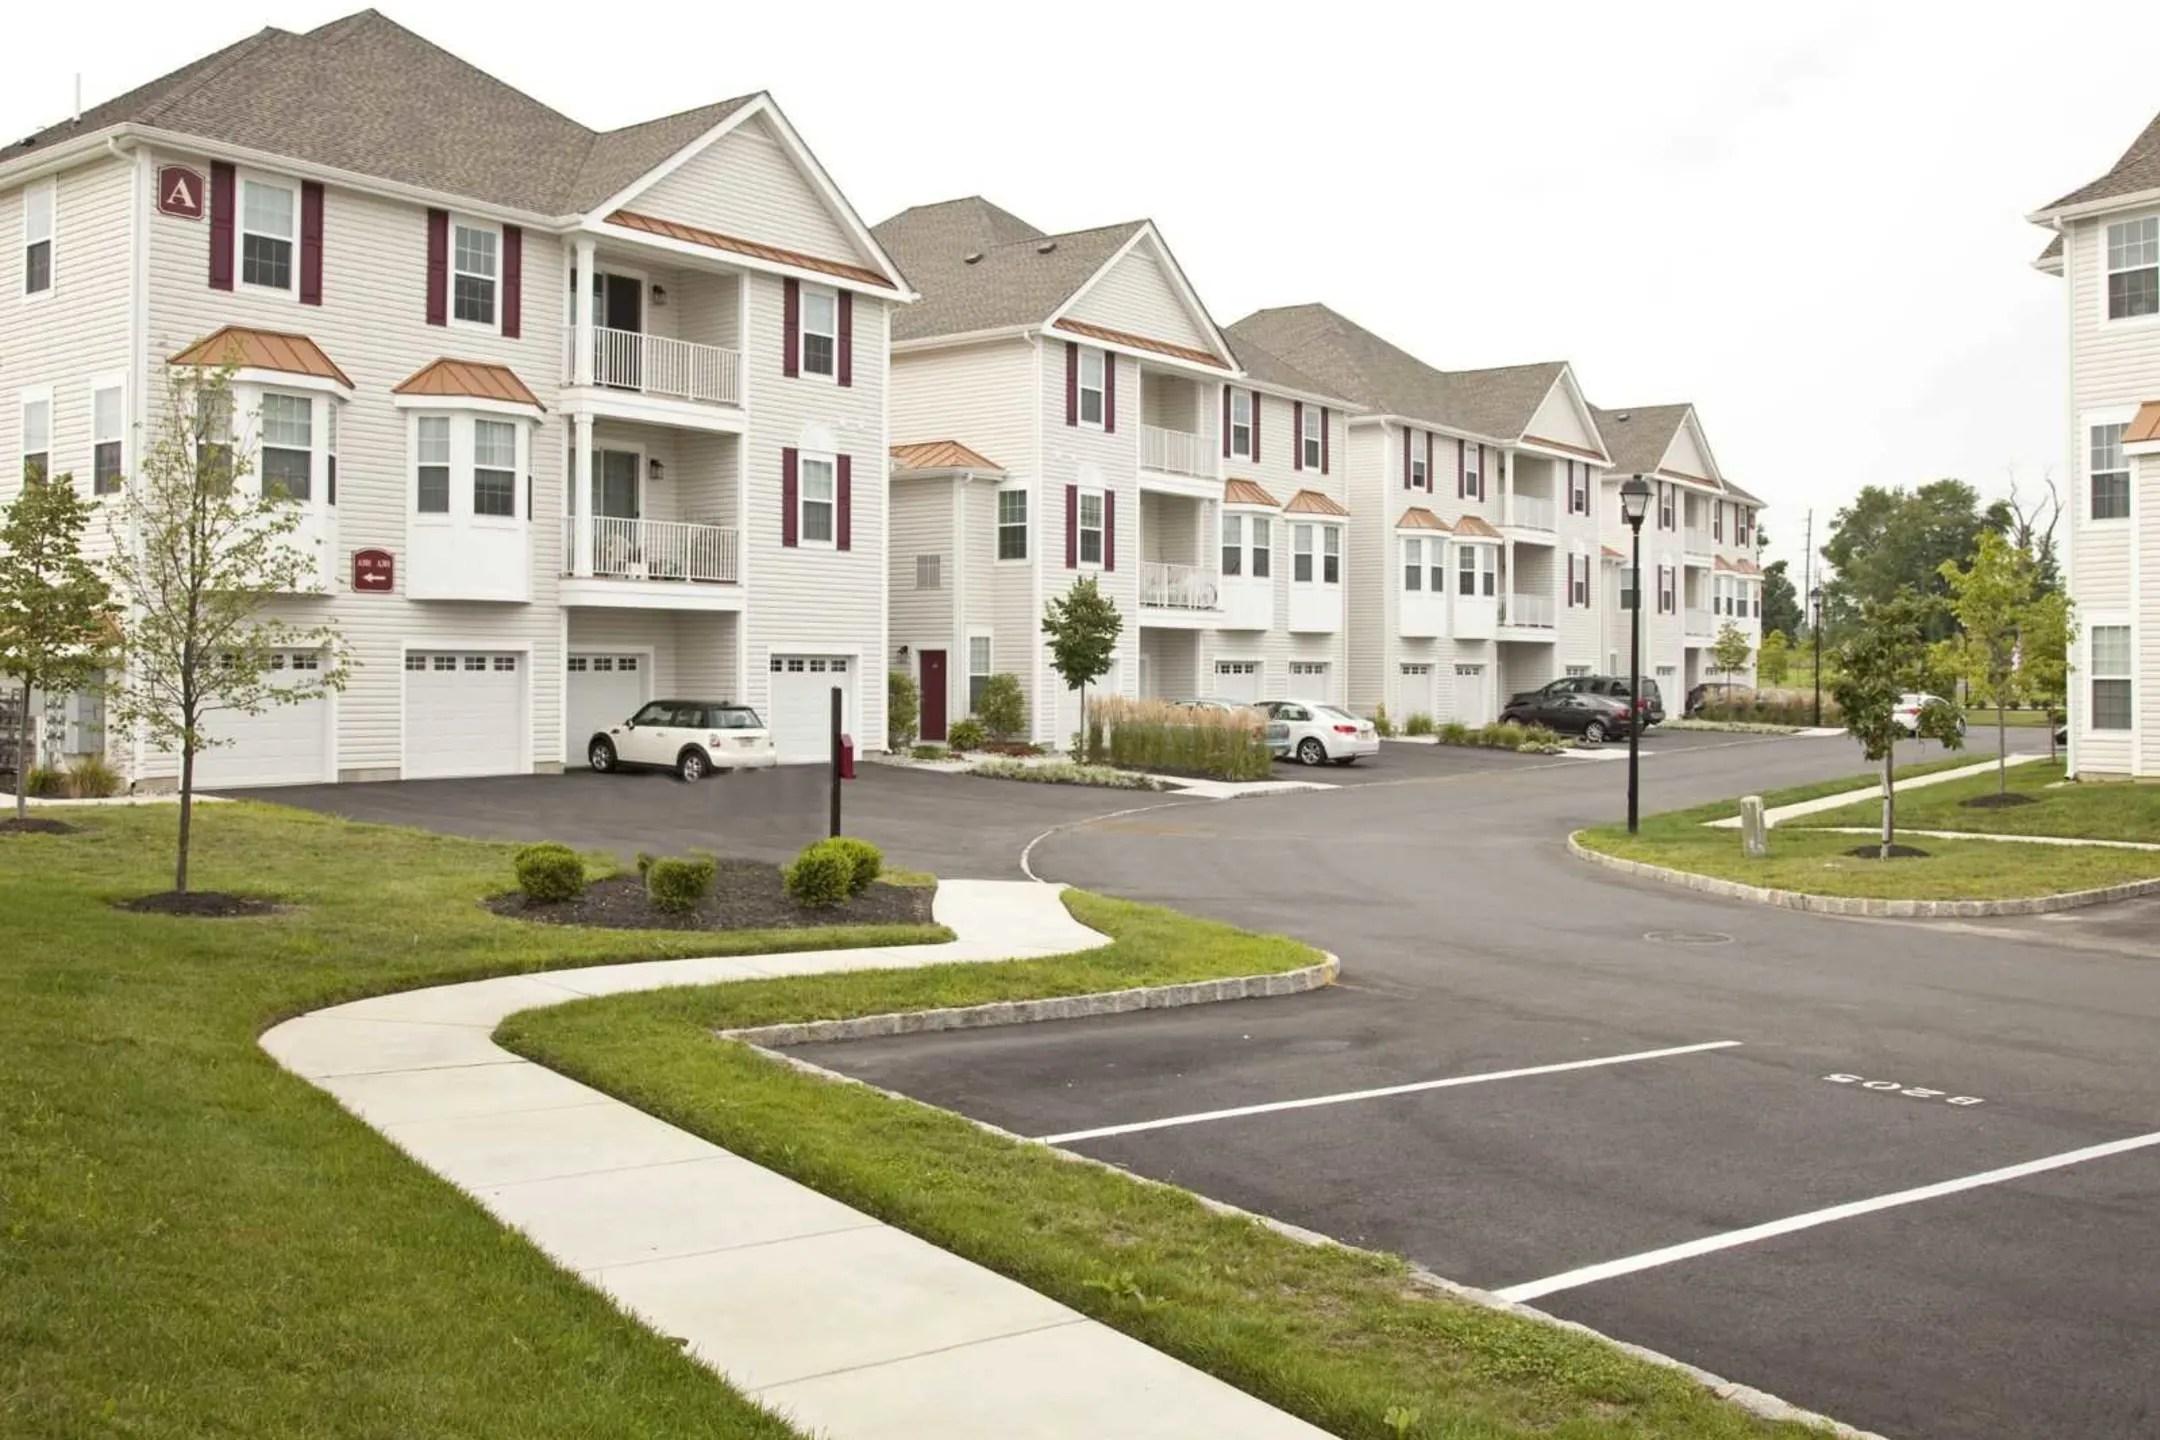 Apartments at Weatherby  Swedesboro NJ 08085